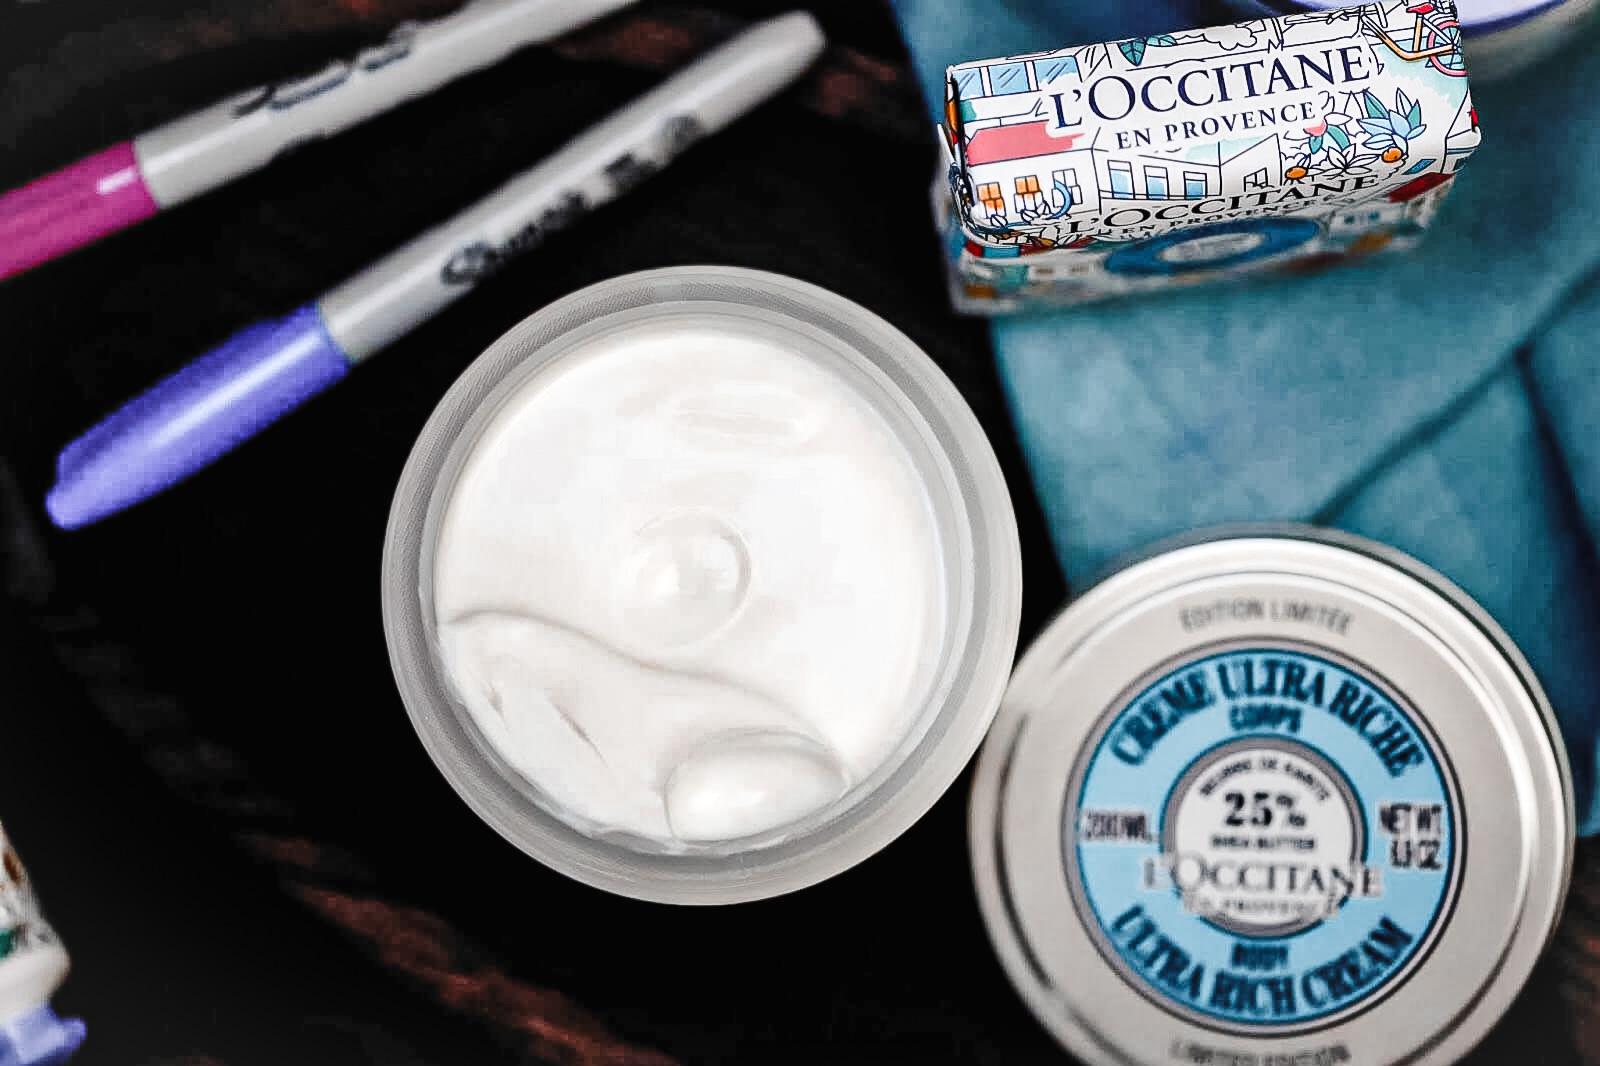 L'Occitane Karité OMY crème 25% avis